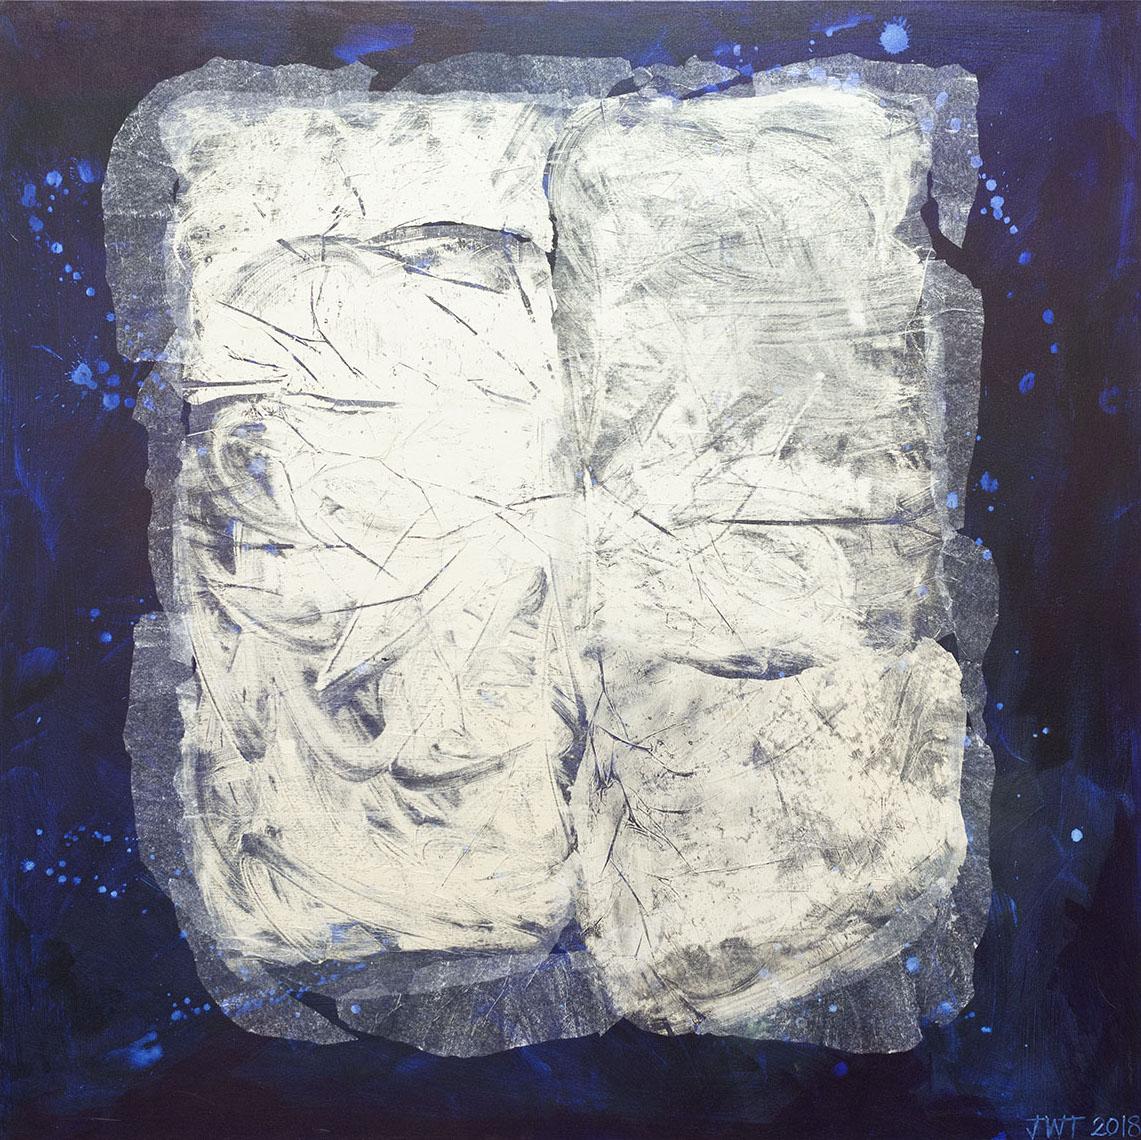 Jessica Watson-Thorp_Najima (Star) _2018_Mono prints on acid free tissue glazed onto canvas_140 x 140 cm58.jpg